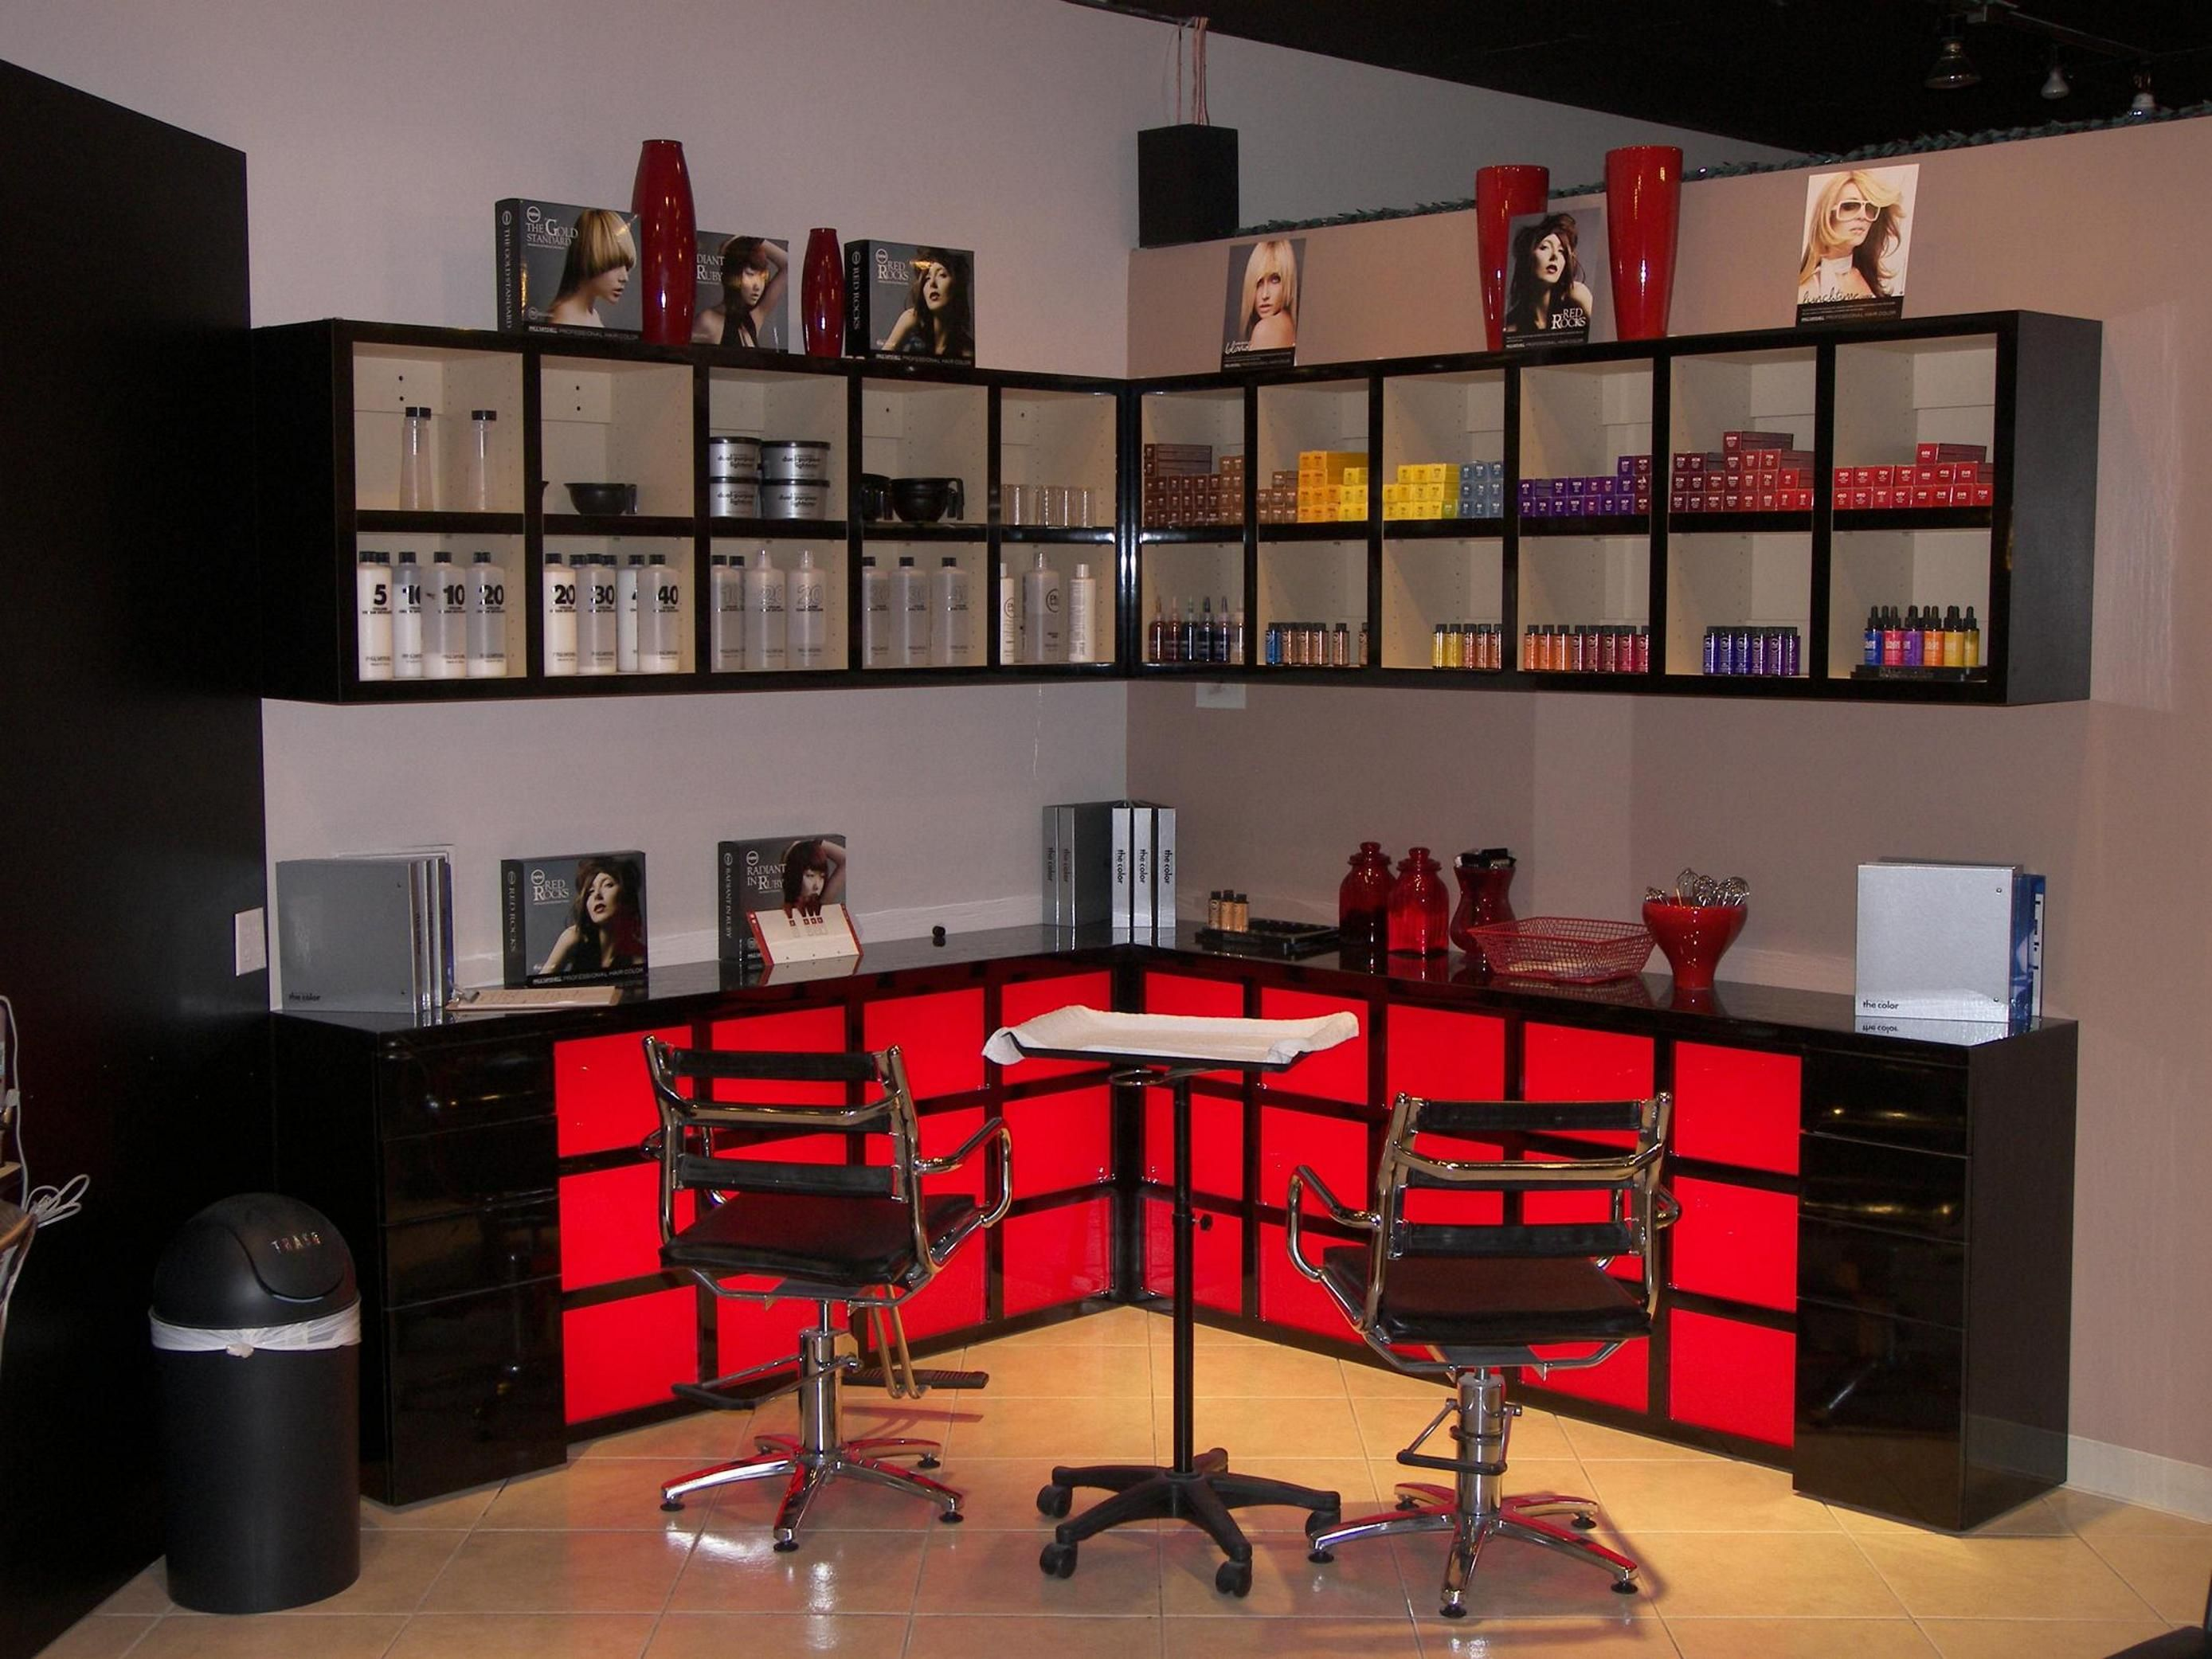 color bar ideas - Google Search | Salon ideas | Pinterest | Salon ...